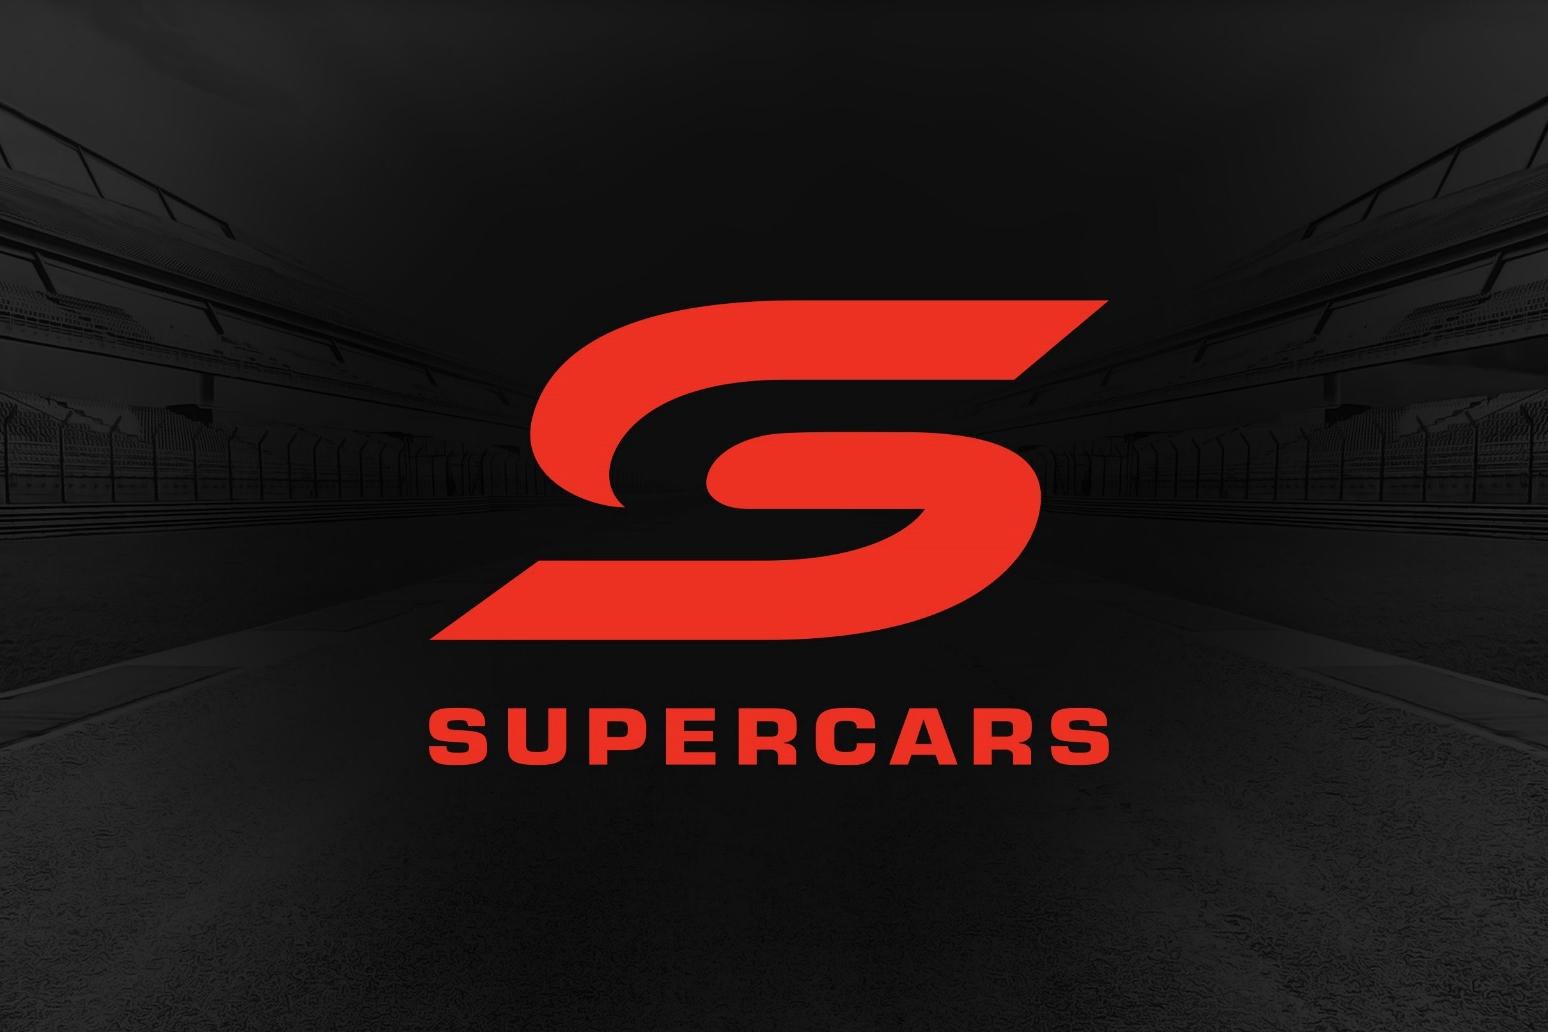 www.supercars.com